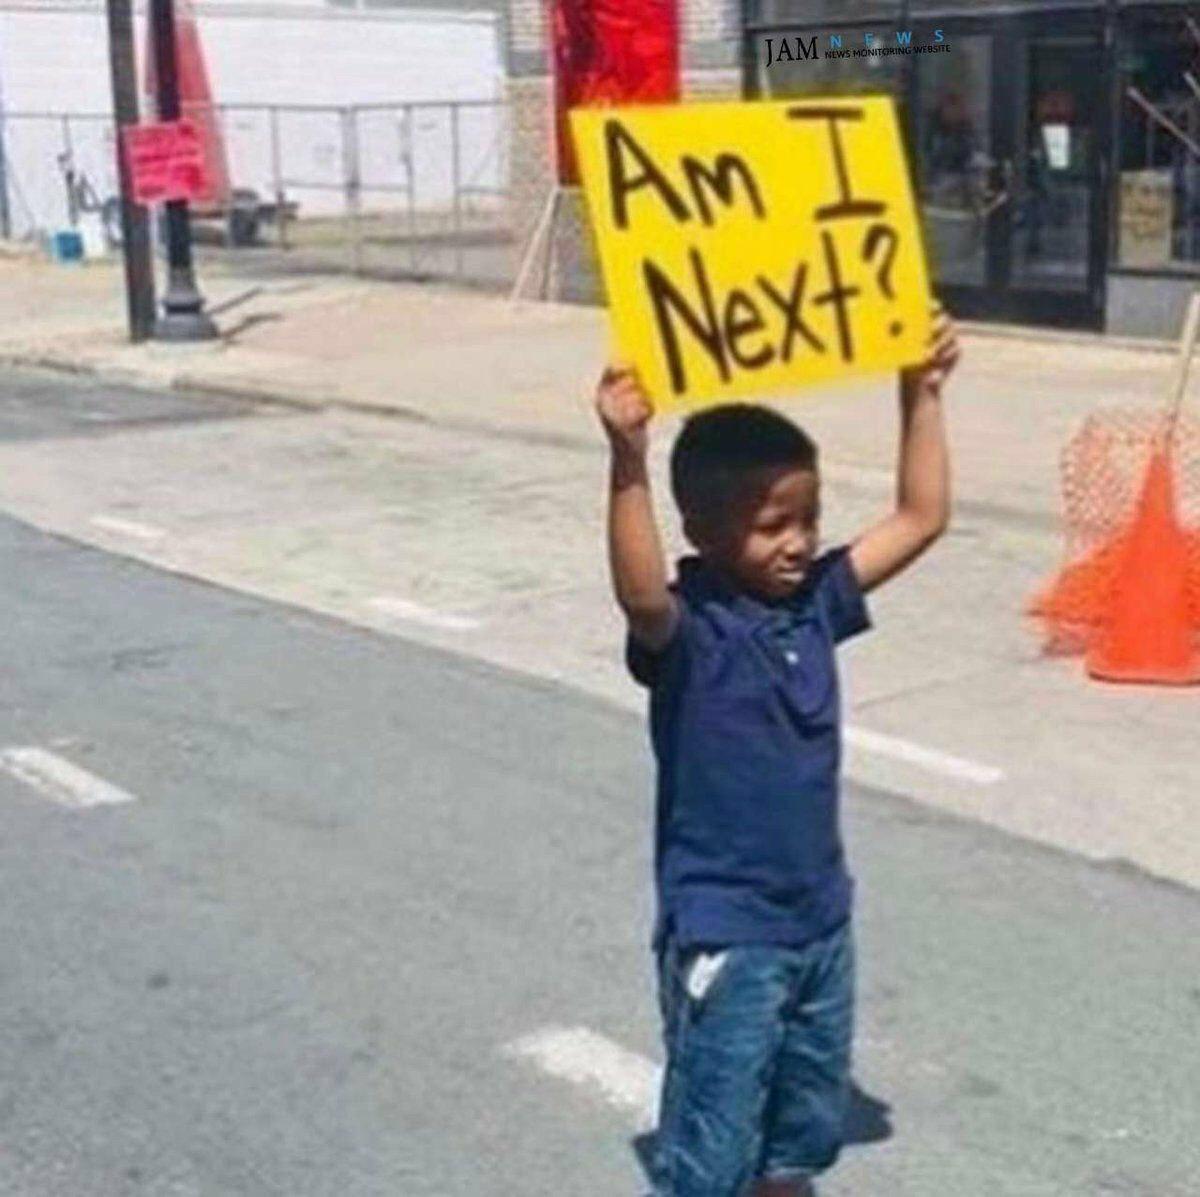 پلاکارد جنجالی یک کودک سیاهپوست +عکس